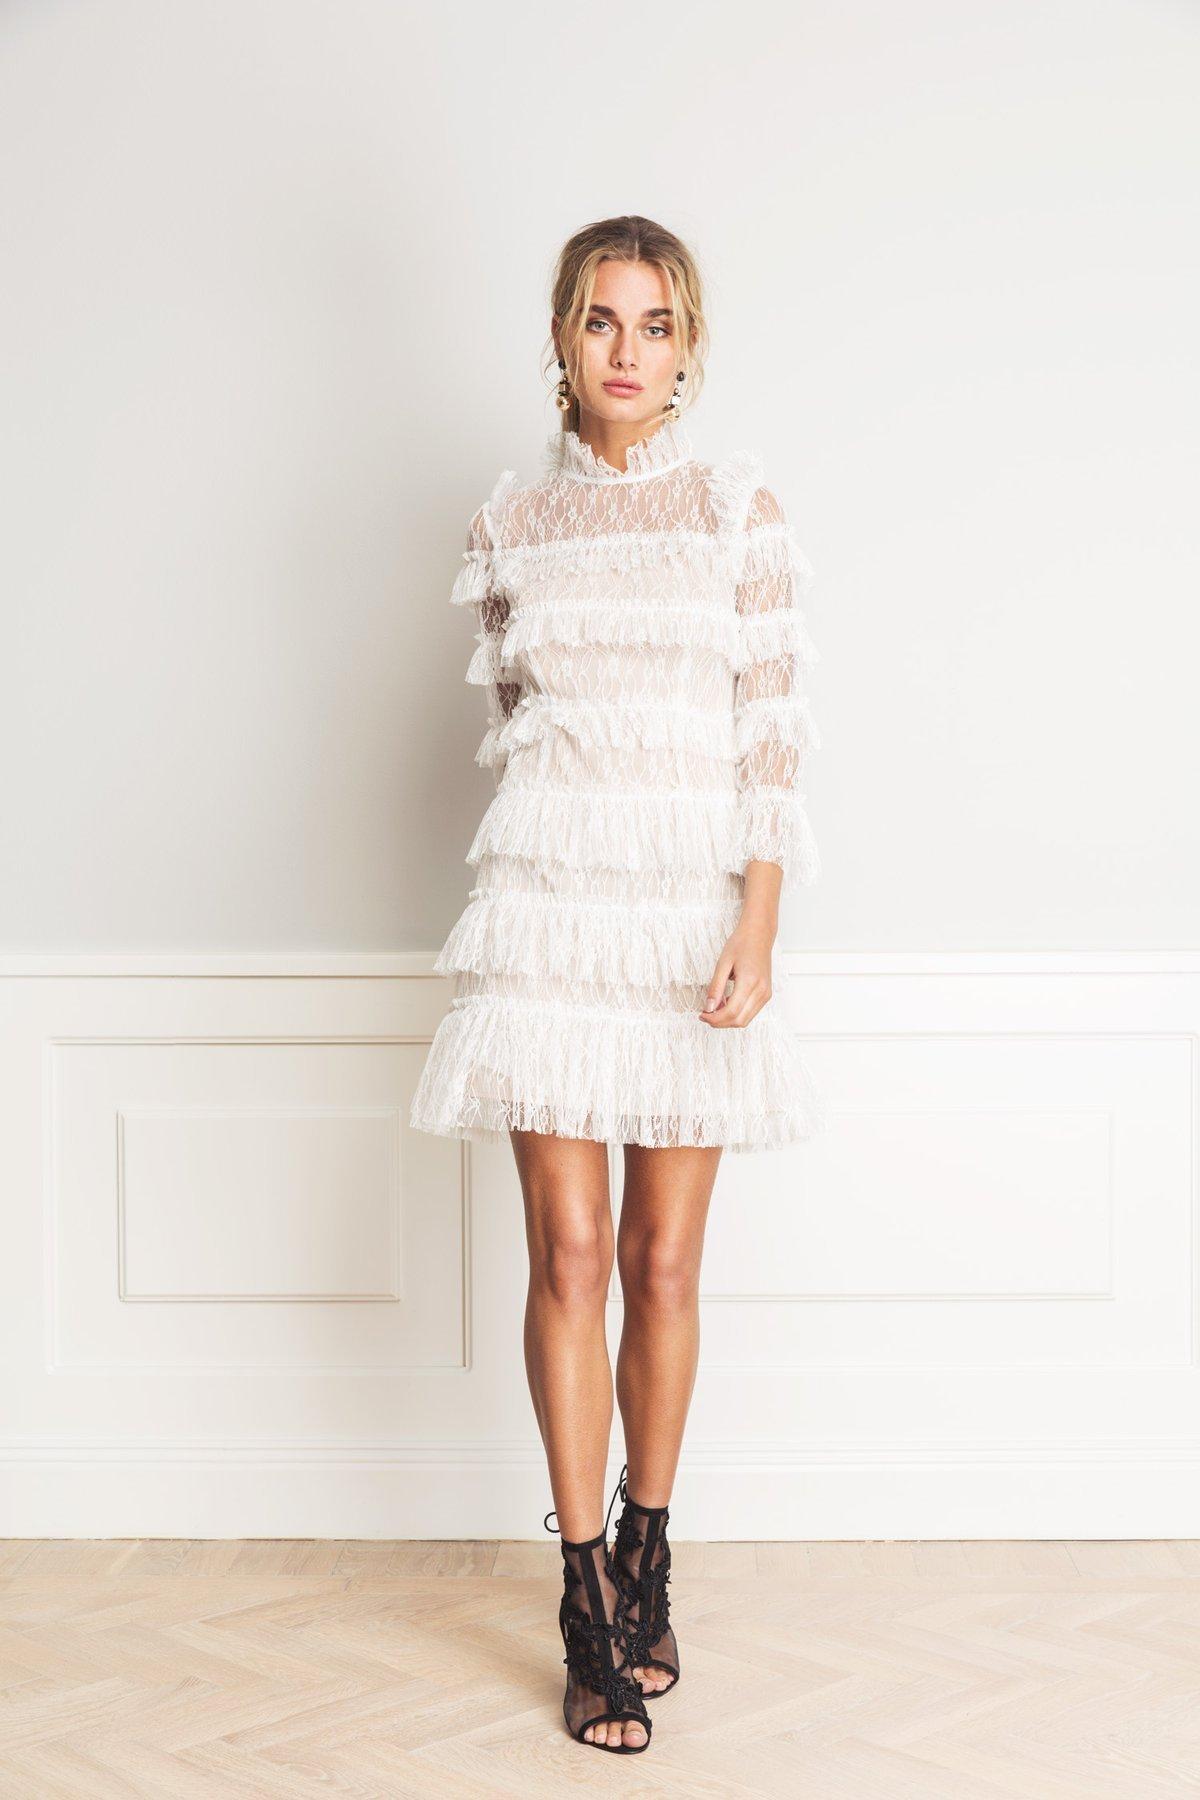 NYSKICK Cloudy White Carmine Mini Dress By Malina cocktailklänning mini klänning